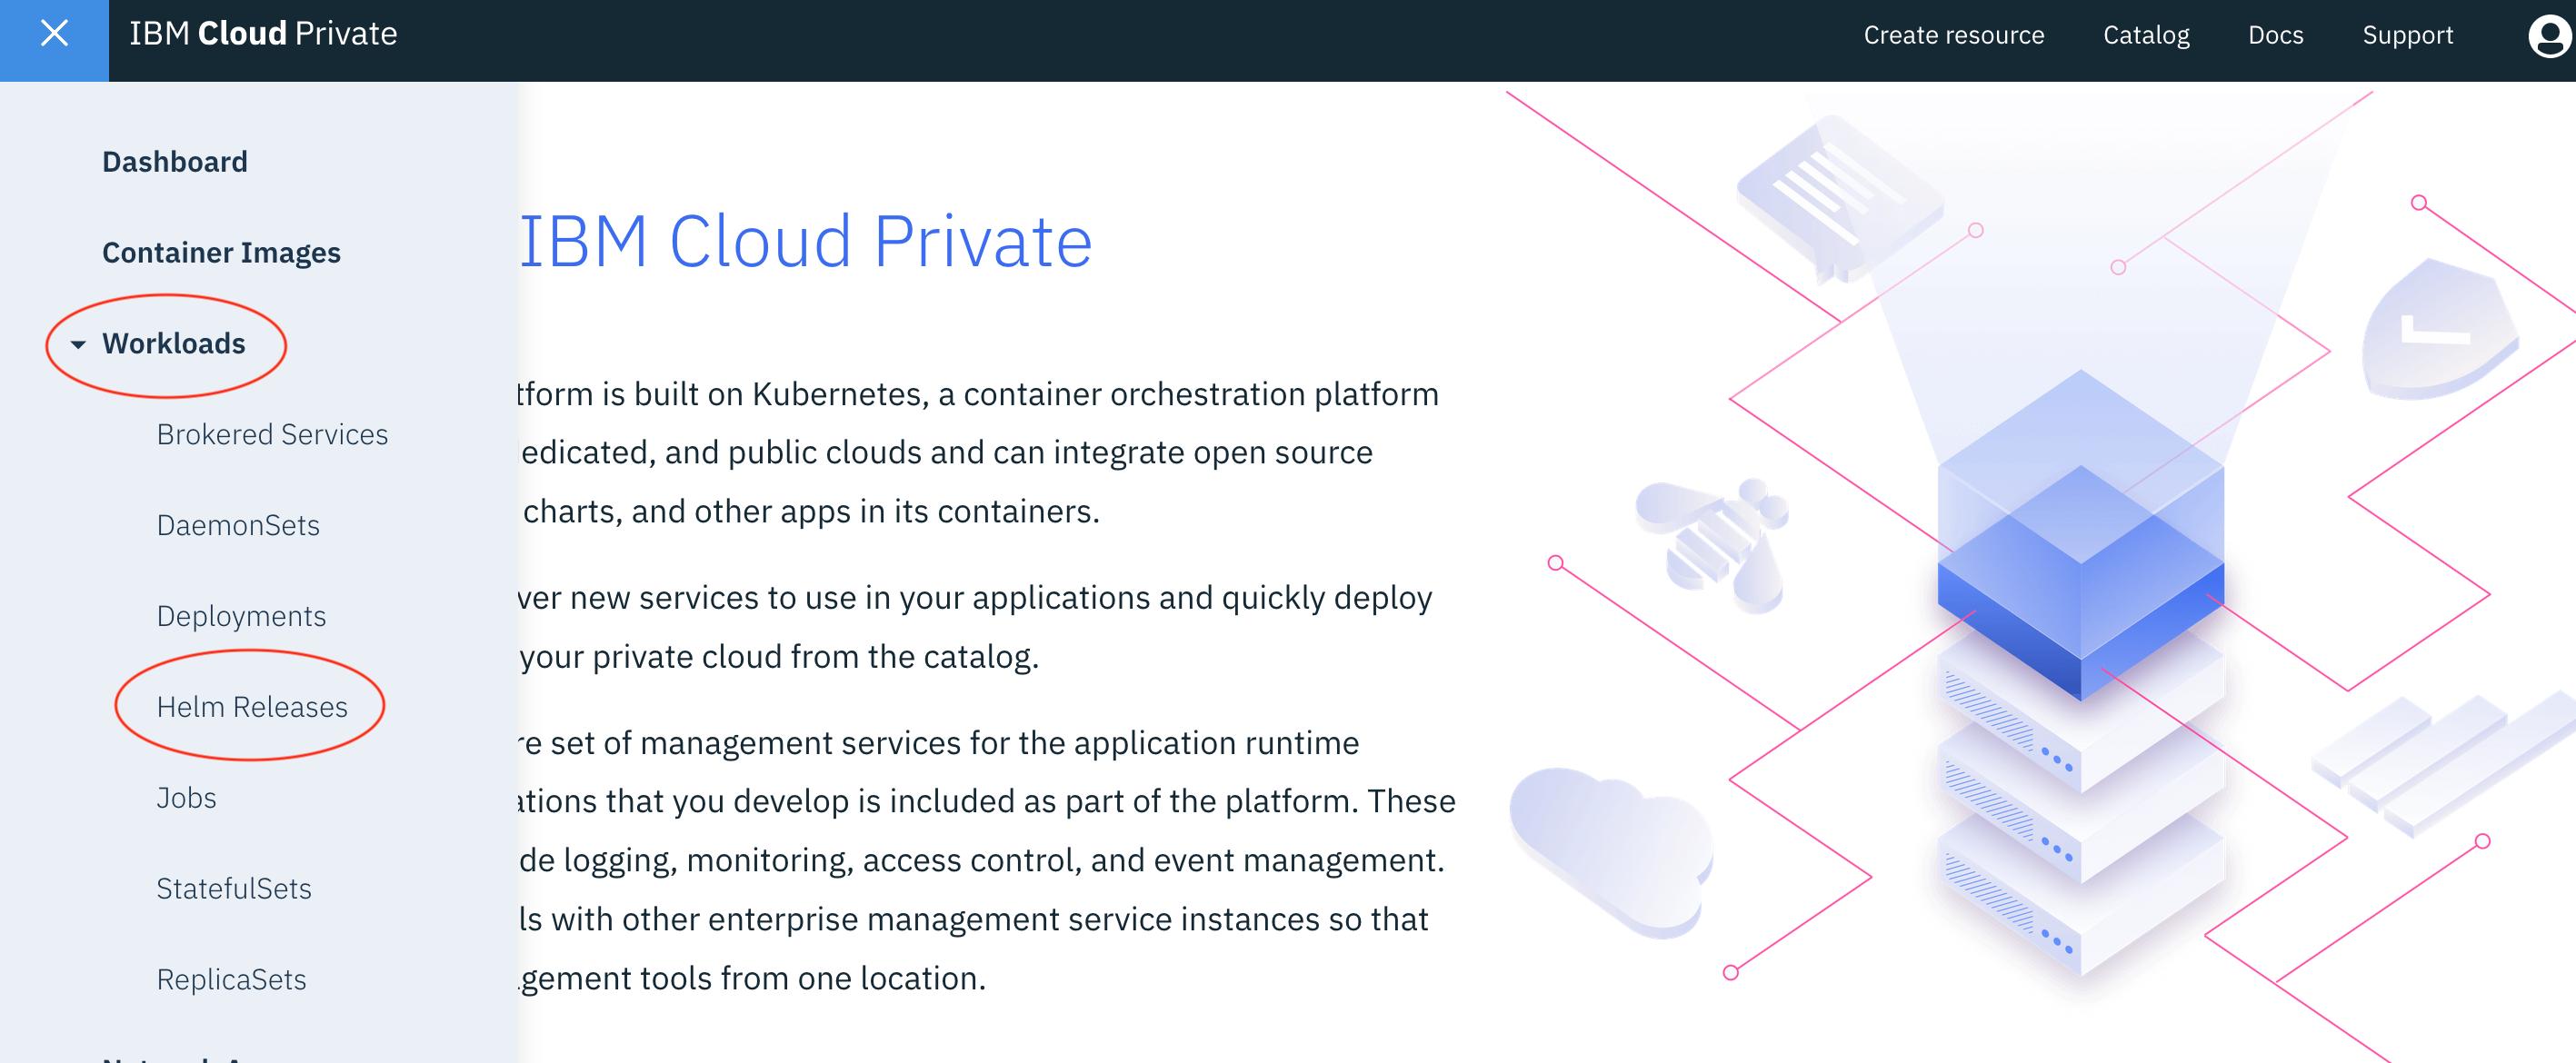 Istioldie 1 0 / Quick Start with IBM Cloud